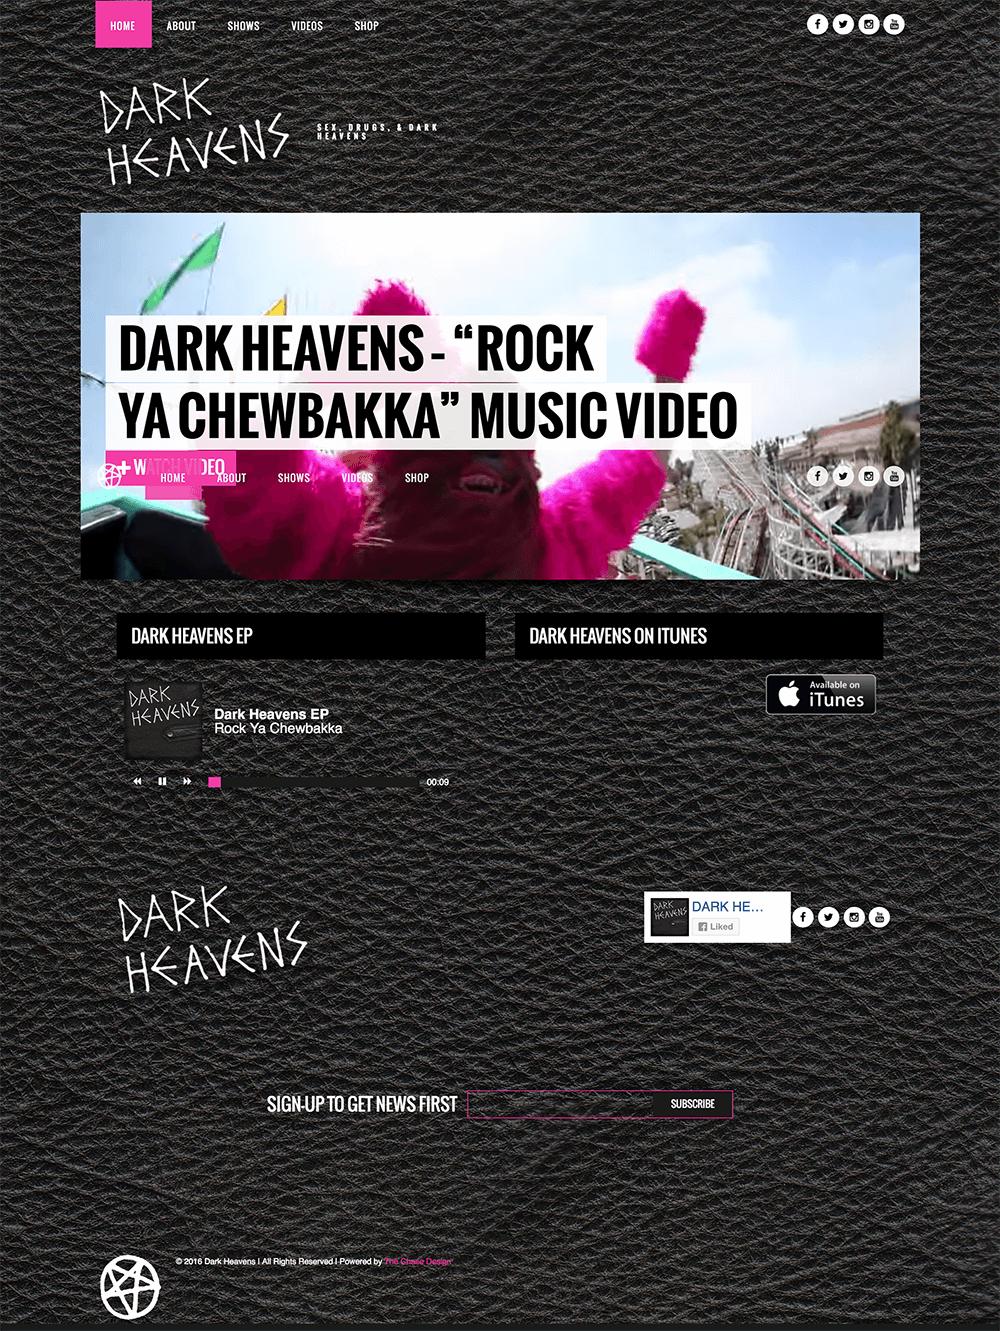 Dark Heavens - The Chase Design